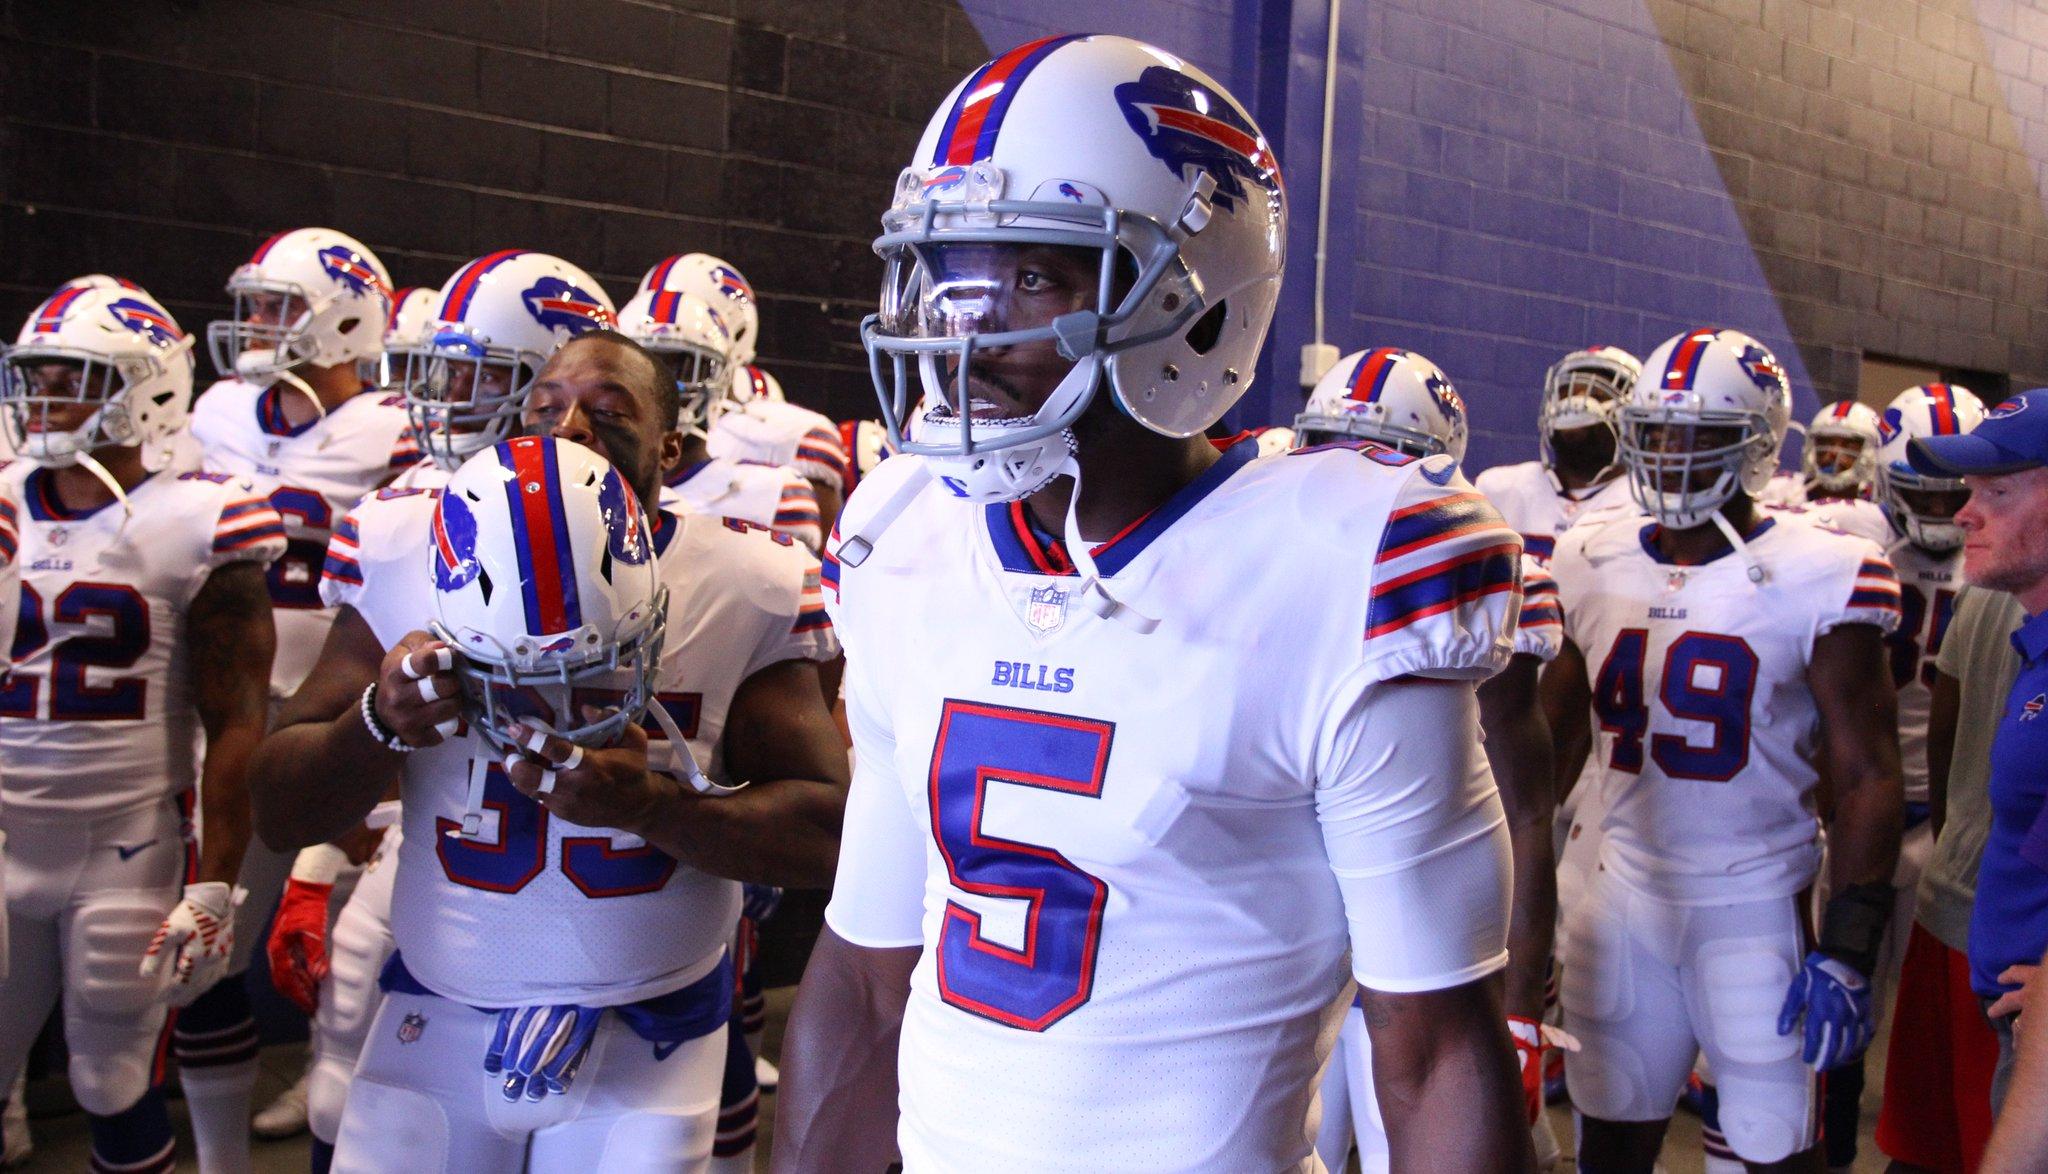 7 bold predictions for the 2017 Buffalo Bills season: https://t.co/a1mJYefYze https://t.co/bkMJpvlove